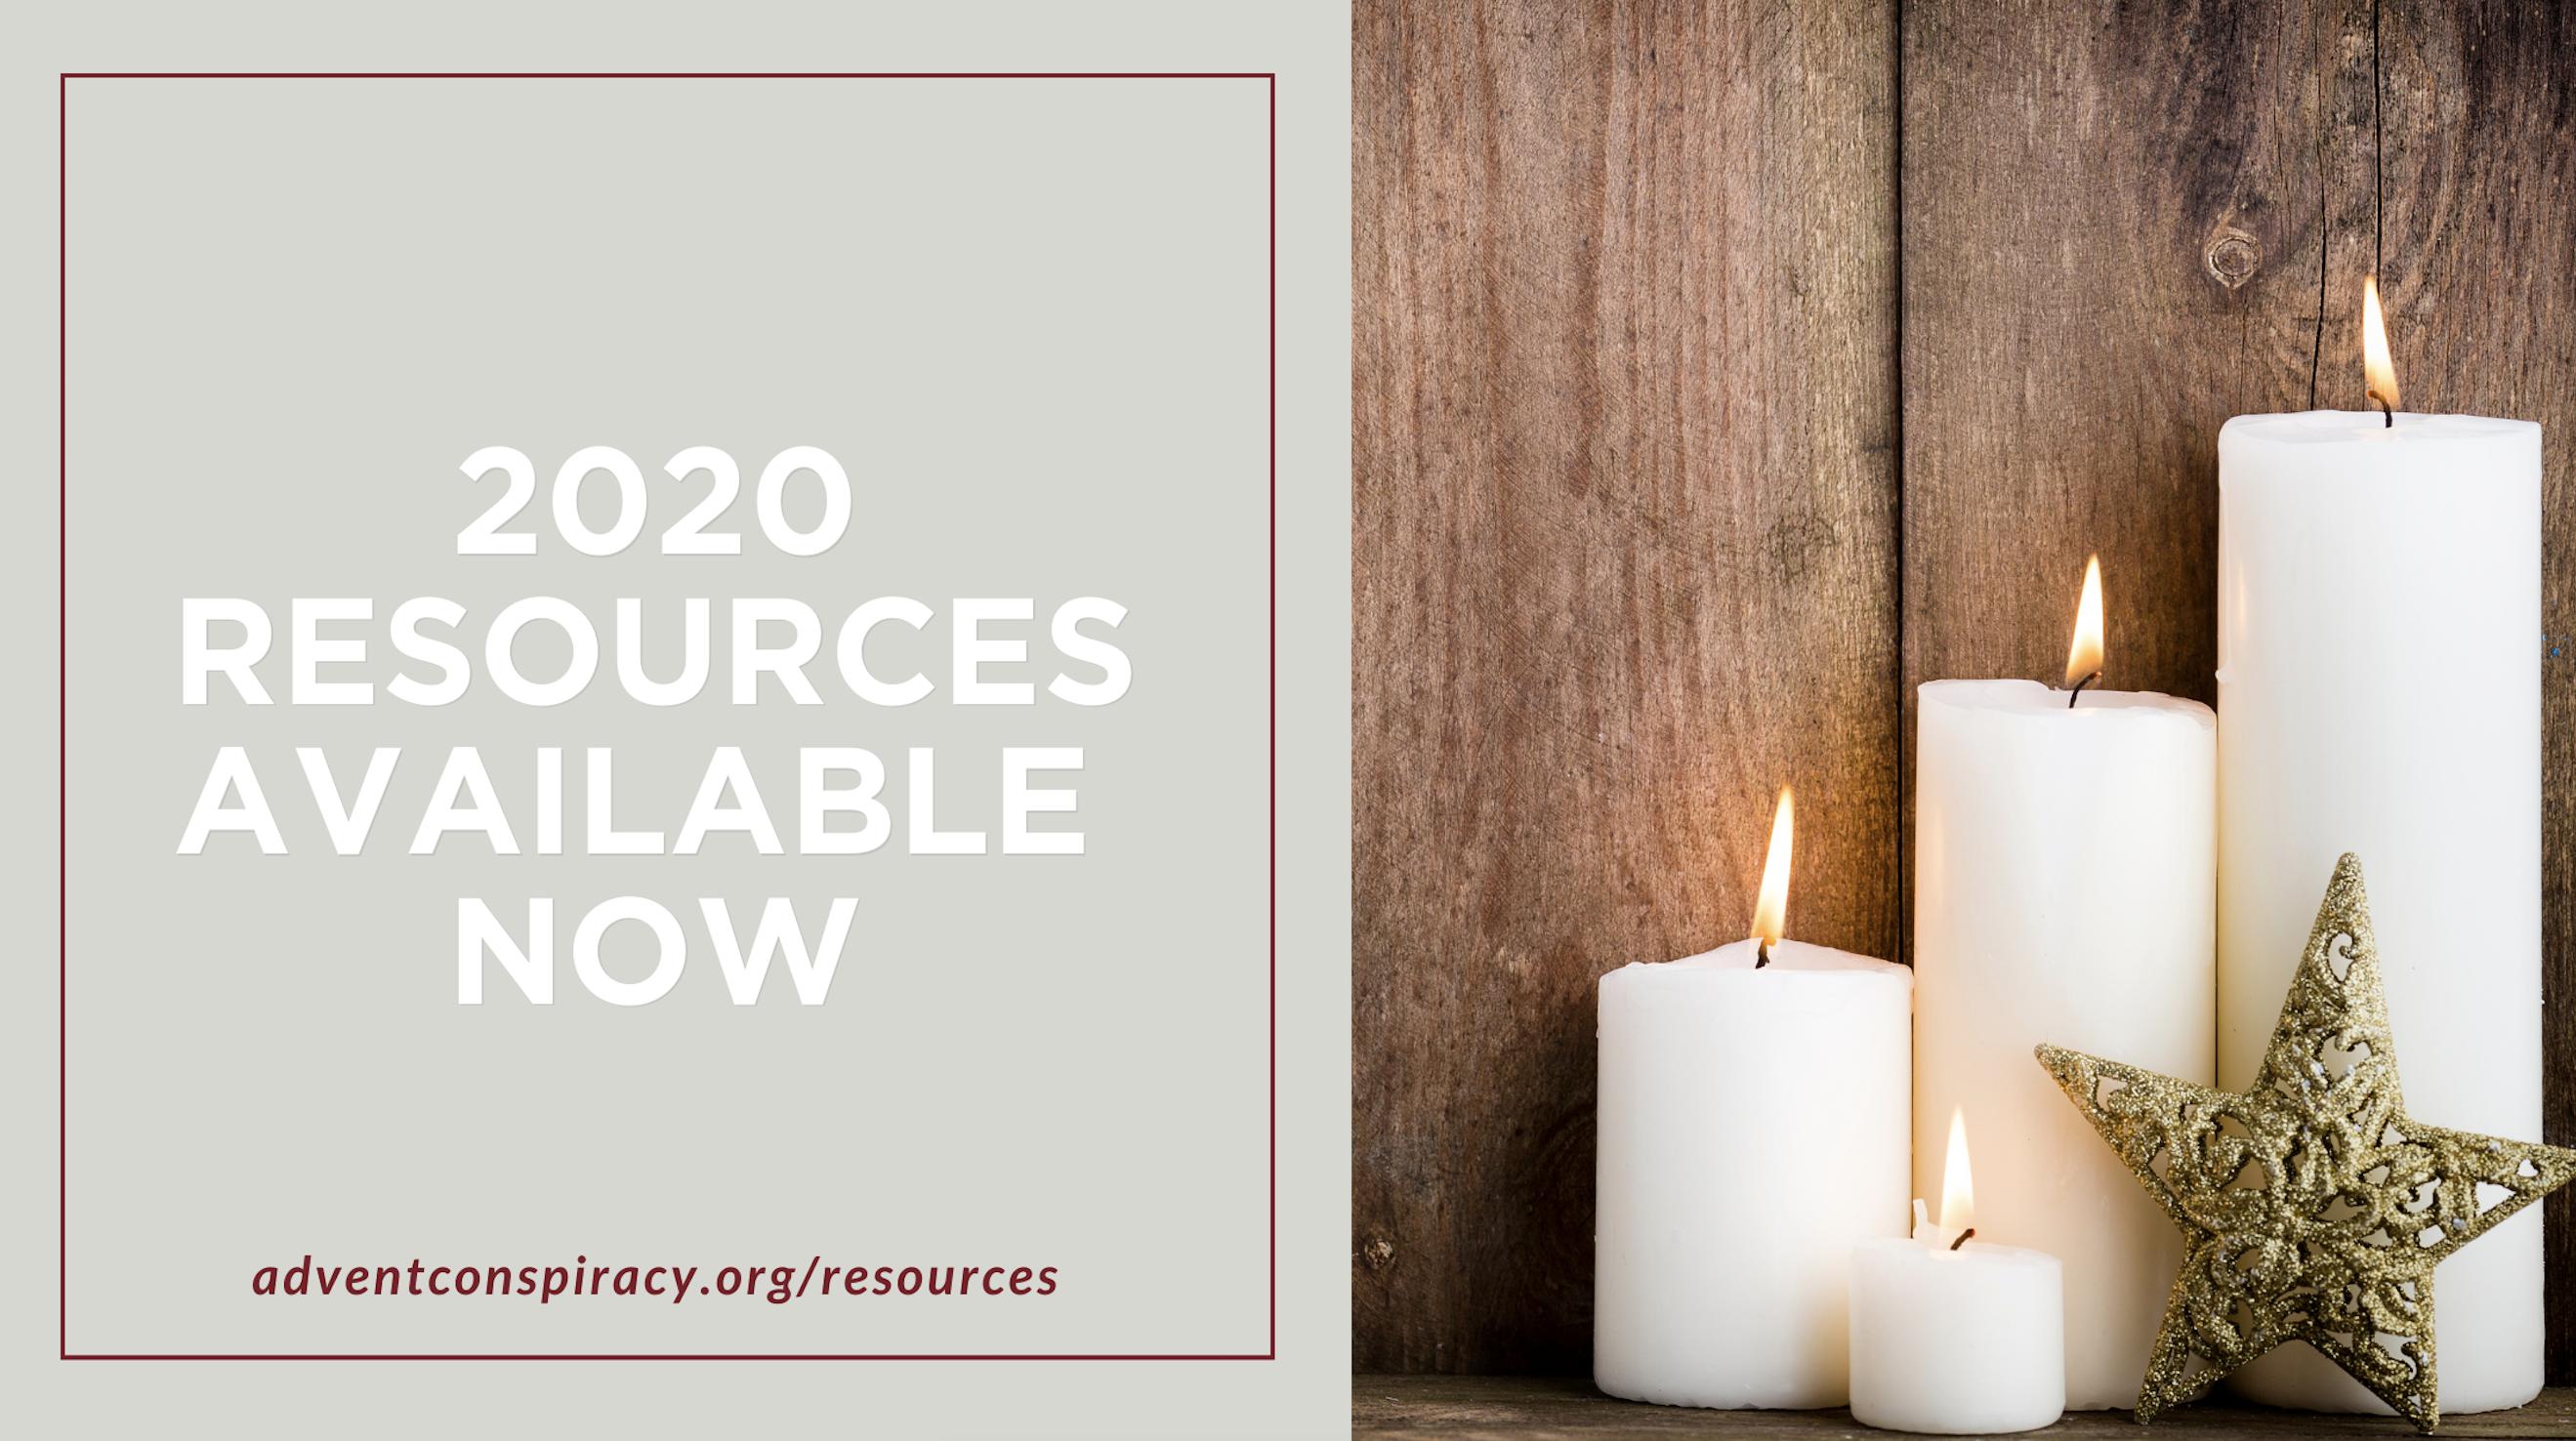 2020 Resources Banner